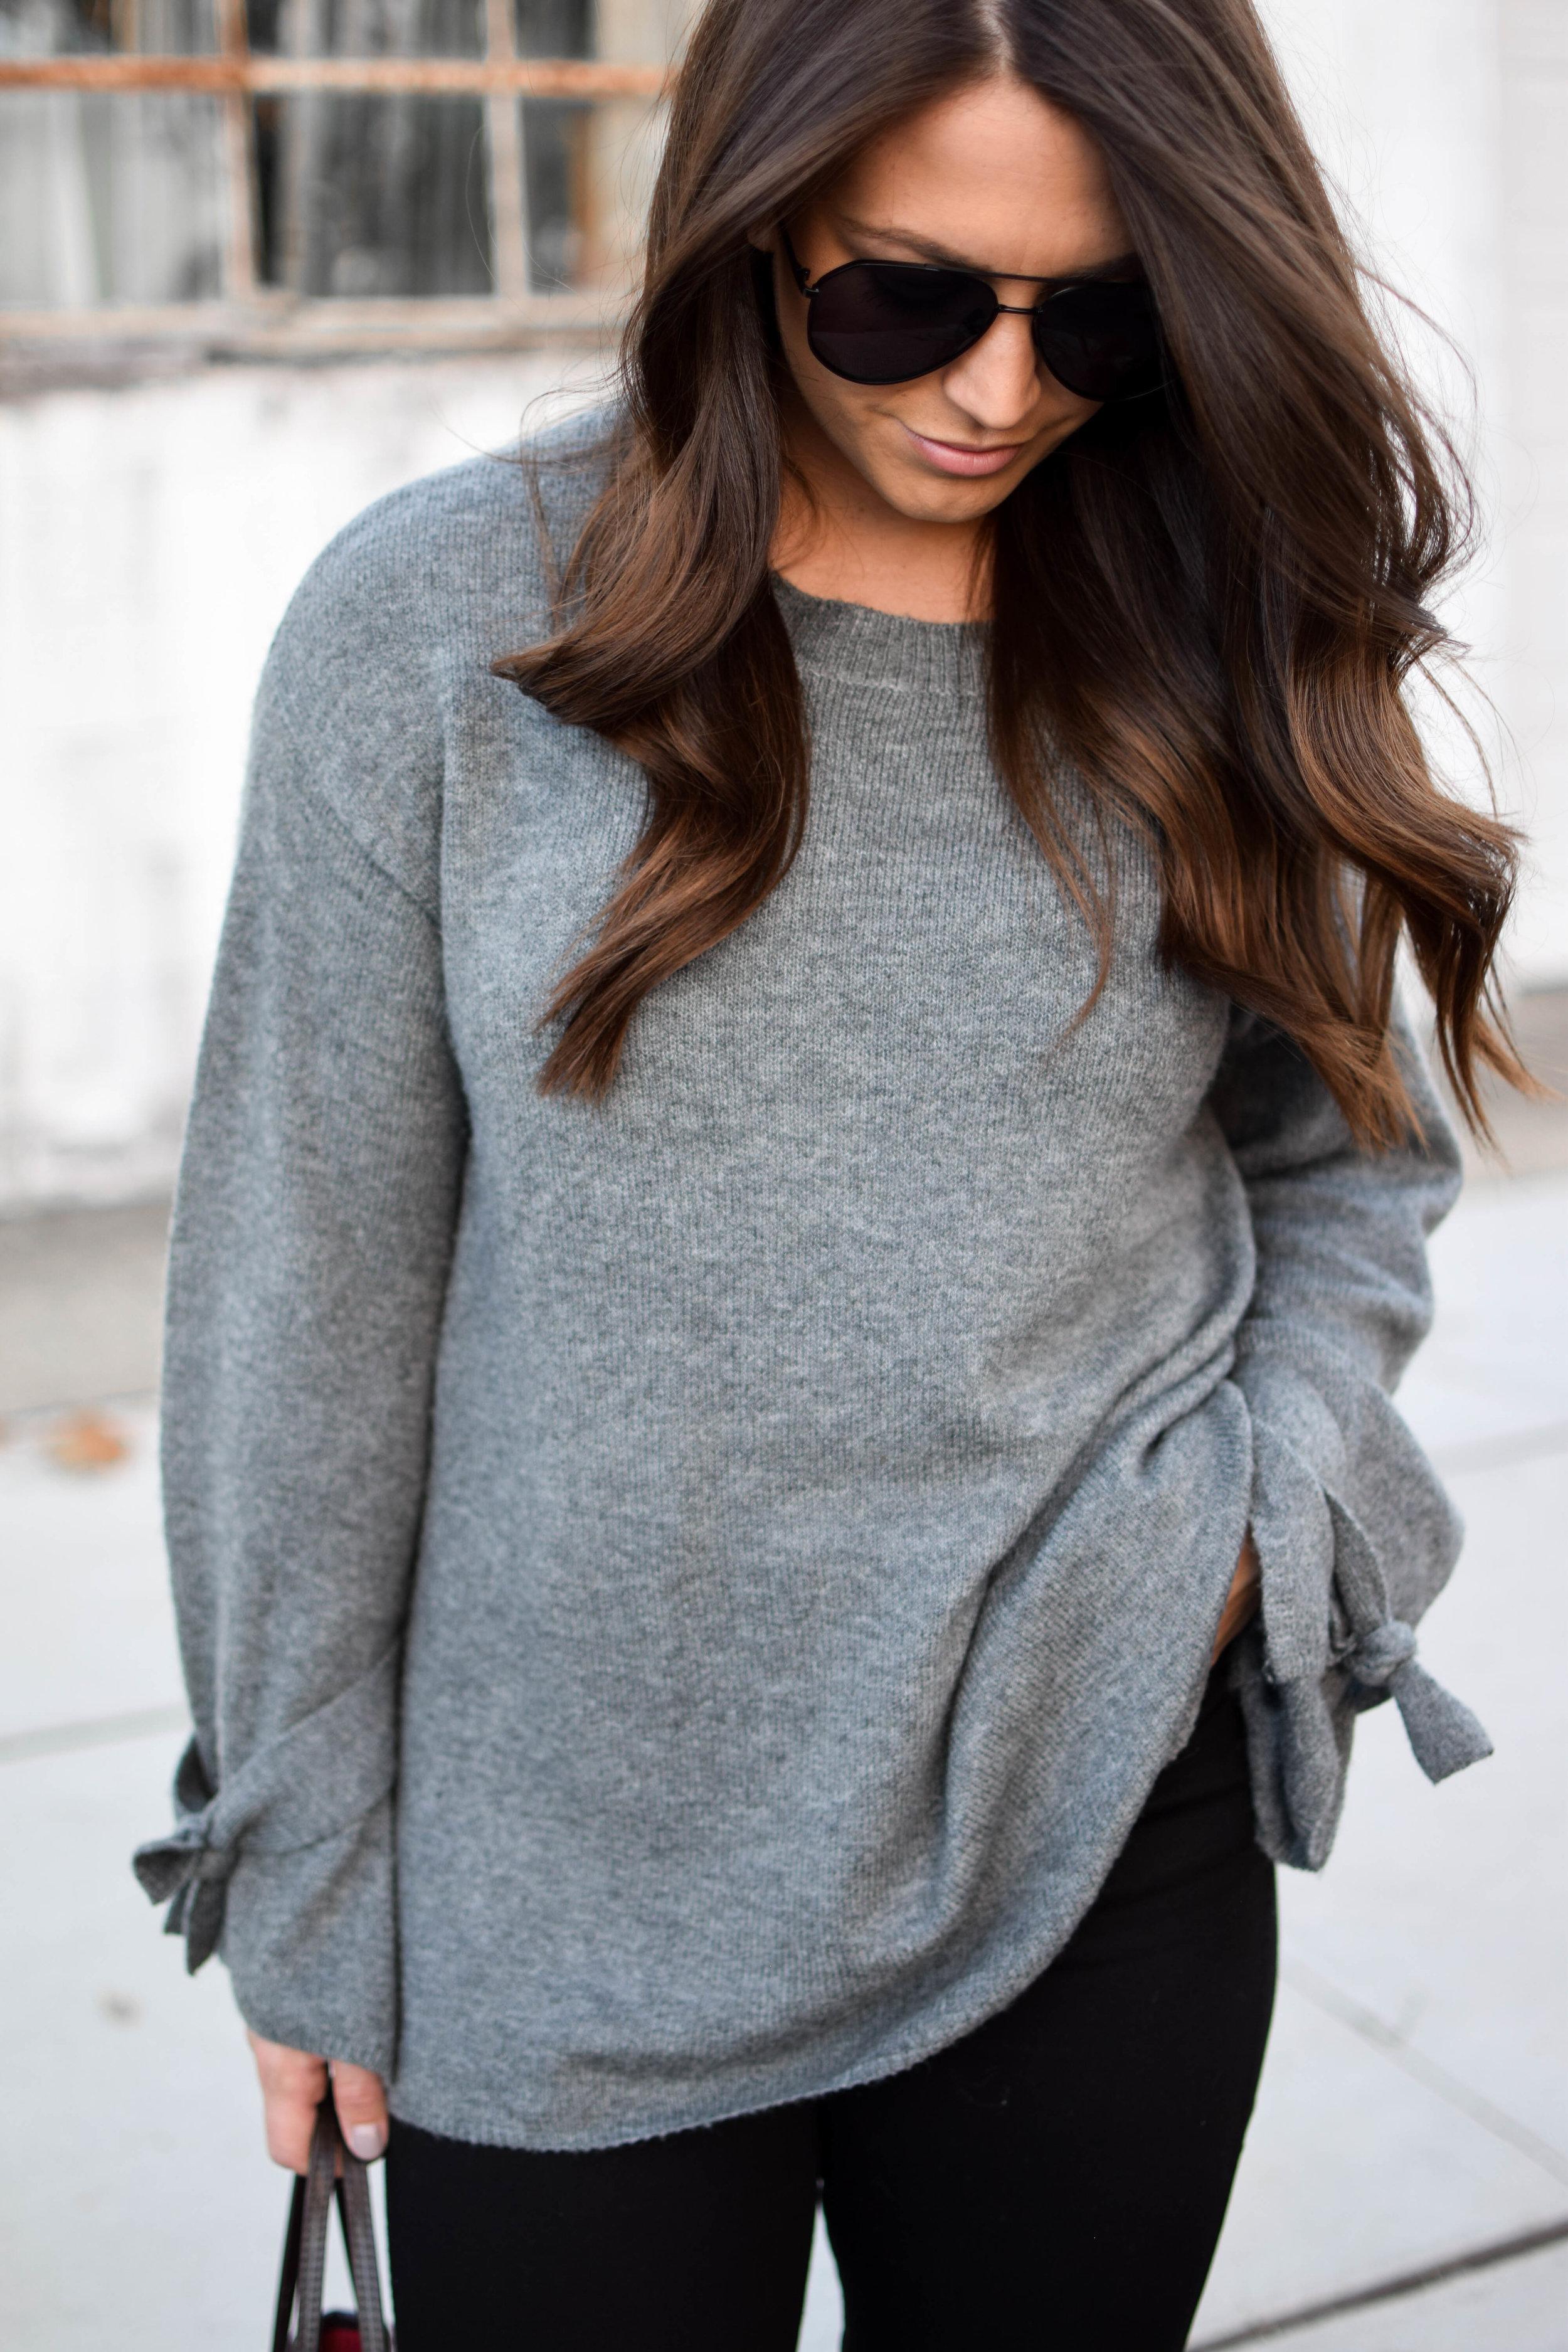 fall fashion / fall outfit idea / fall outfit inspiration / fall closet essentials / black denim / tie sleeve sweater / diff eyewear